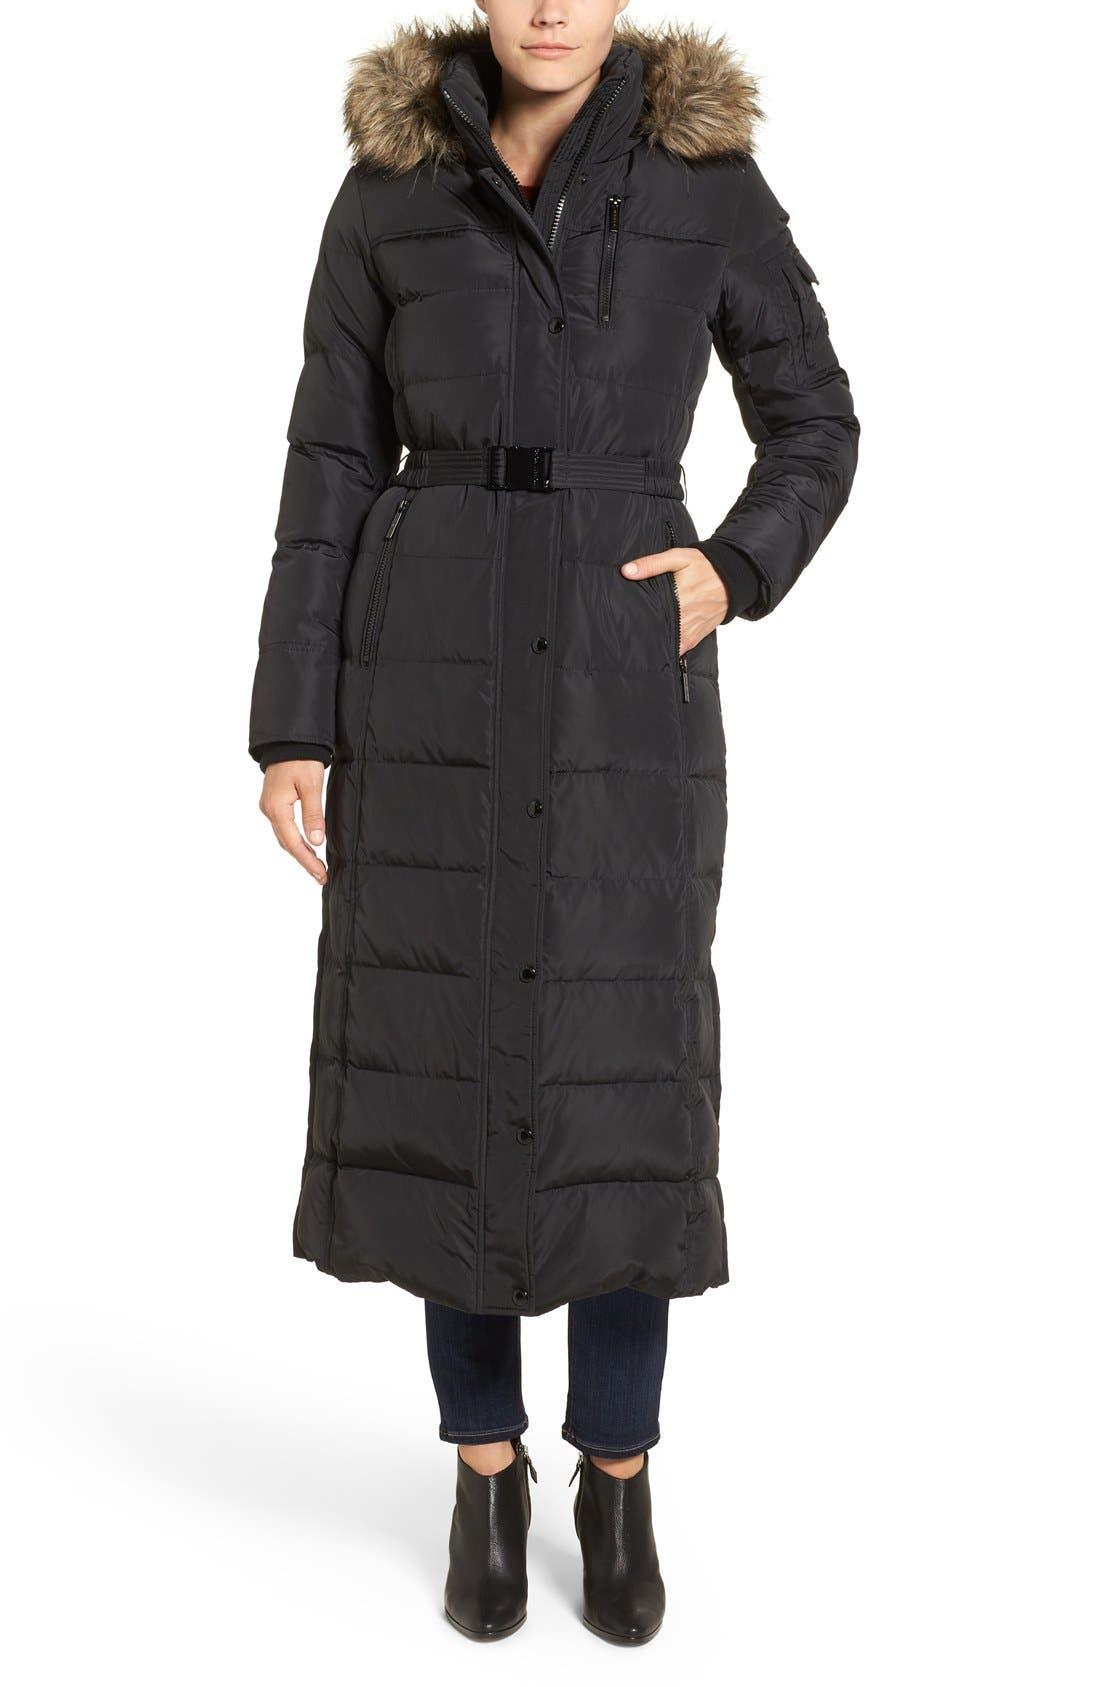 KORS MICHAEL KORS Faux Fur Trim Belted Down & Feather Fill Maxi Coat, Main, color, 001